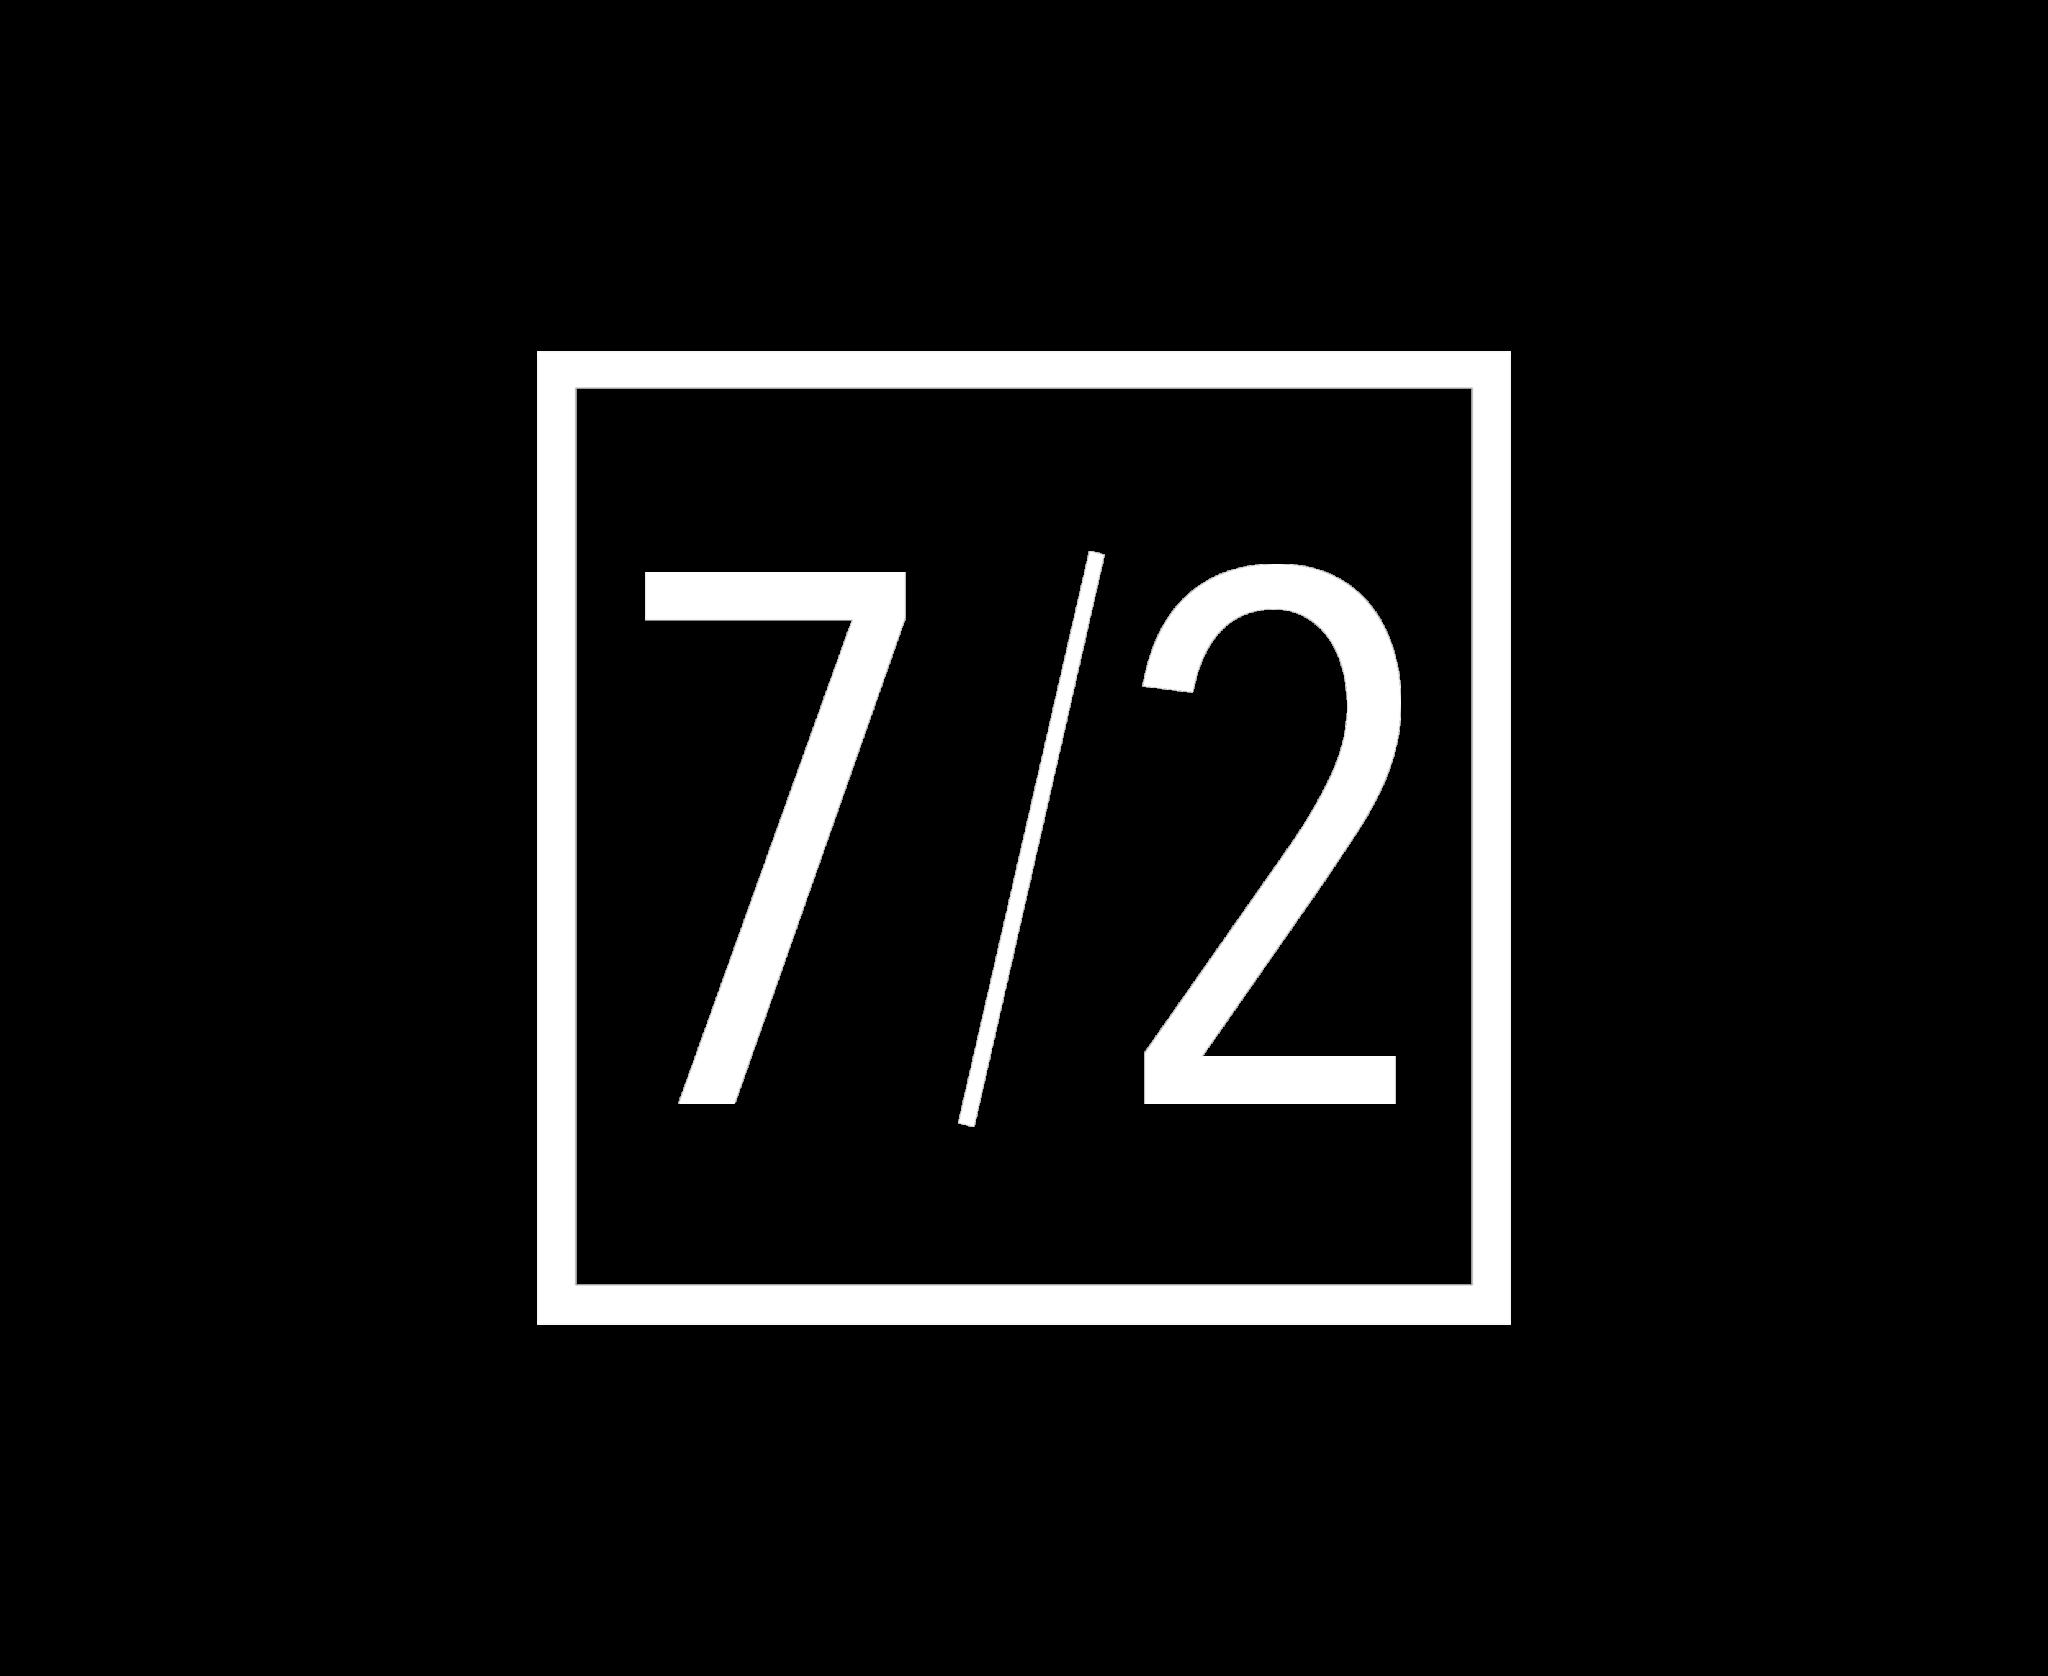 72 Denim